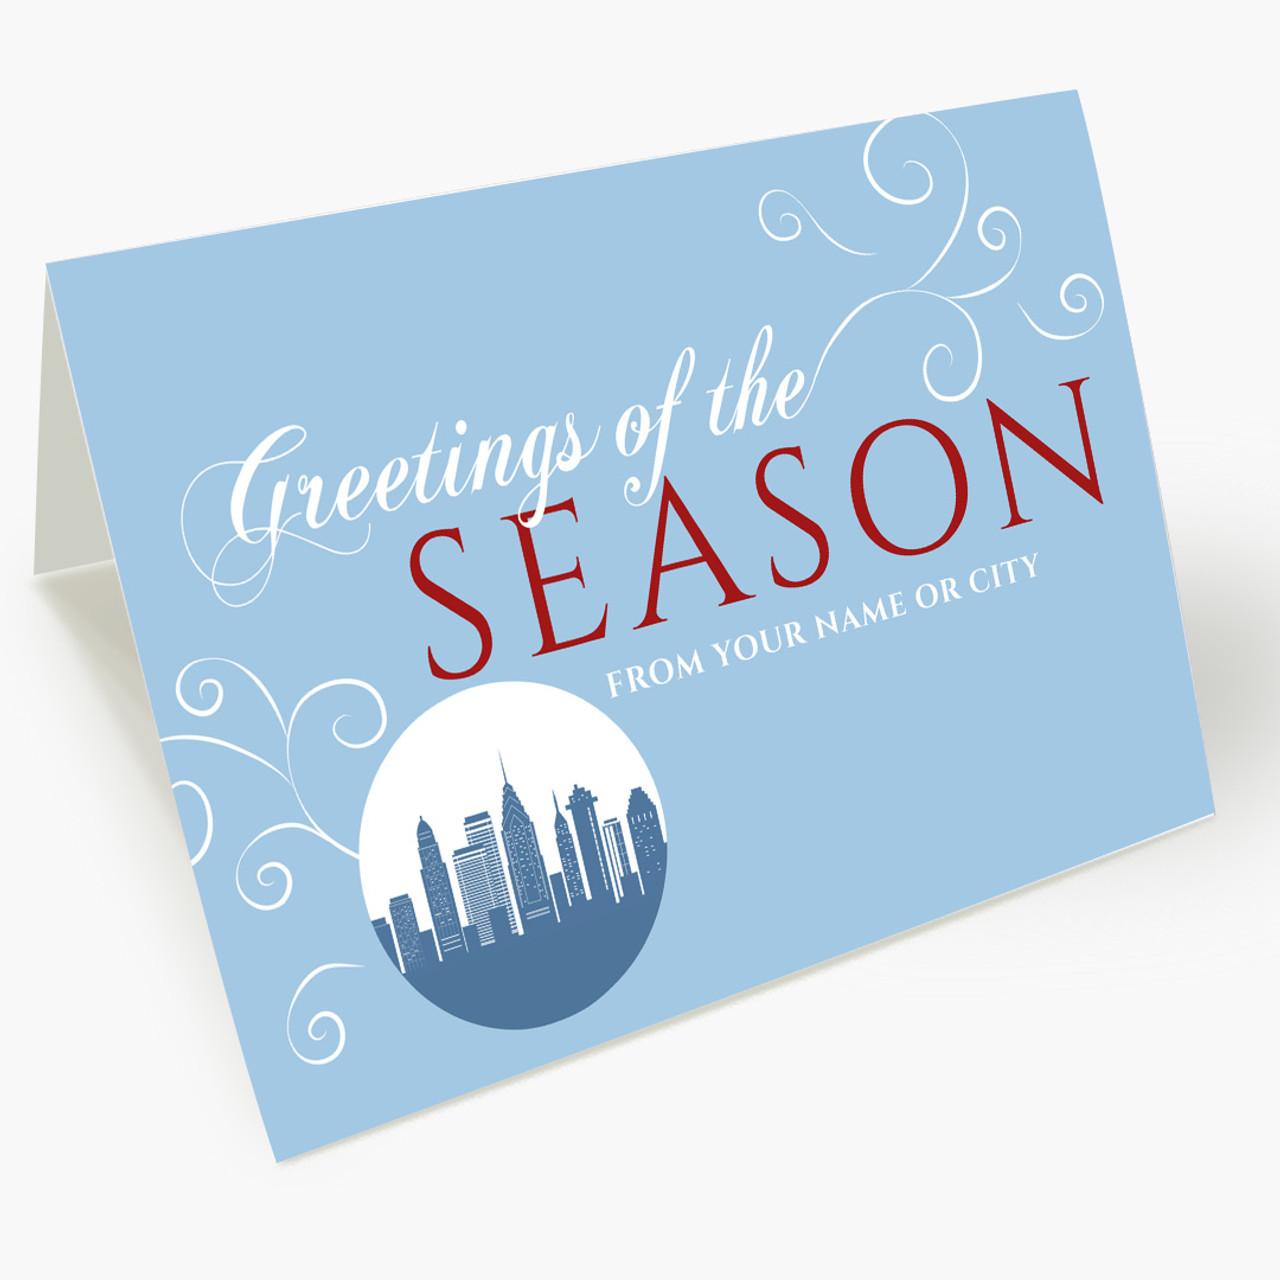 A Philadelphia Greeting Christmas Card